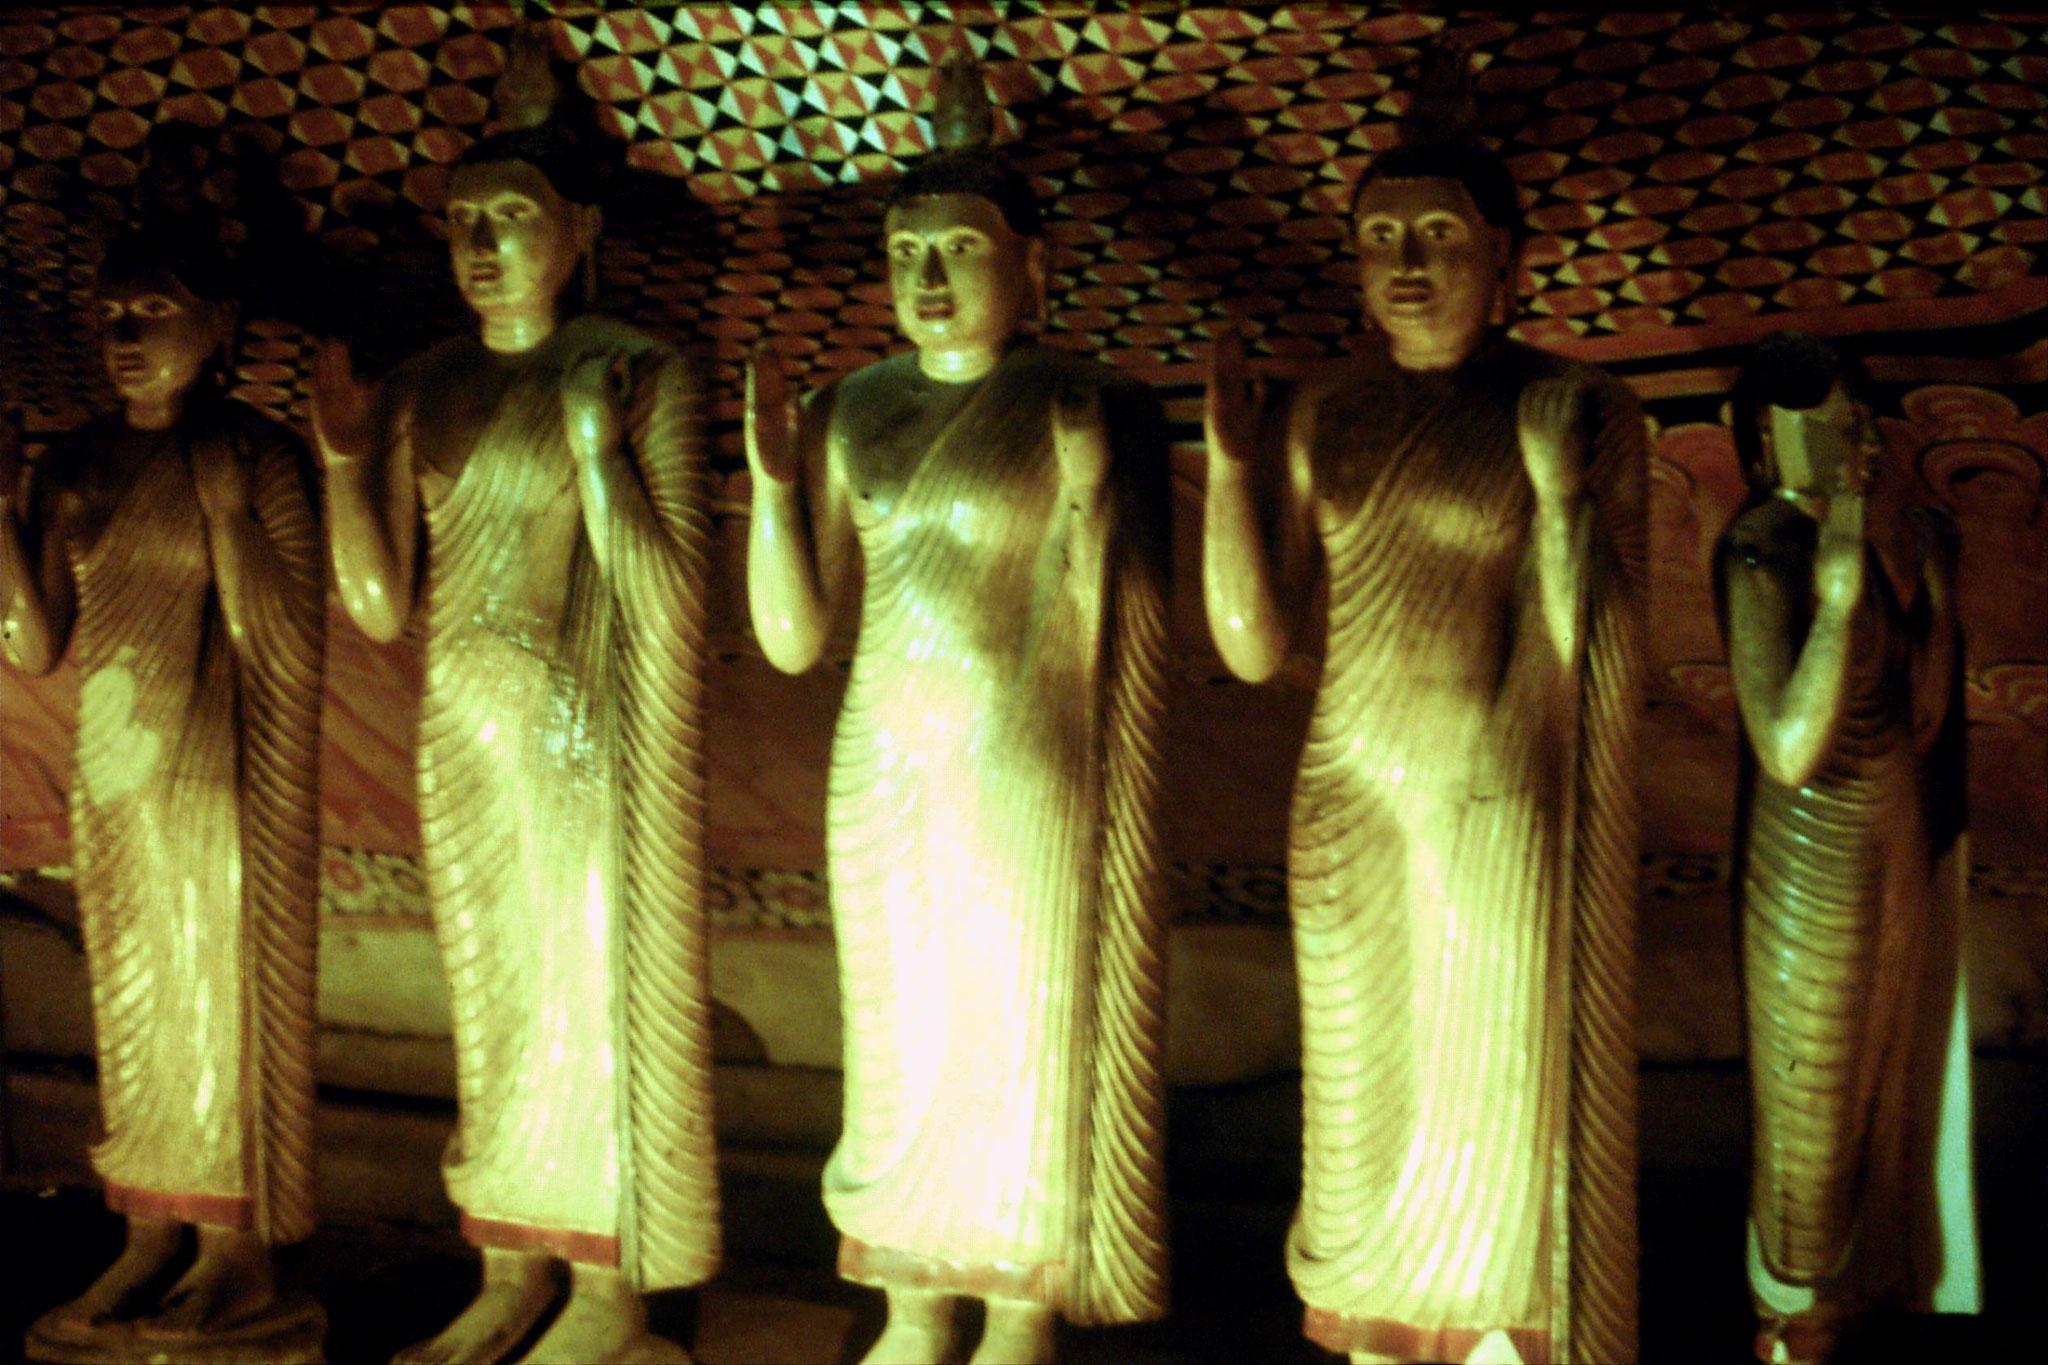 102/26: 6/2/1990 Dambulla - temple built by last Kandy king